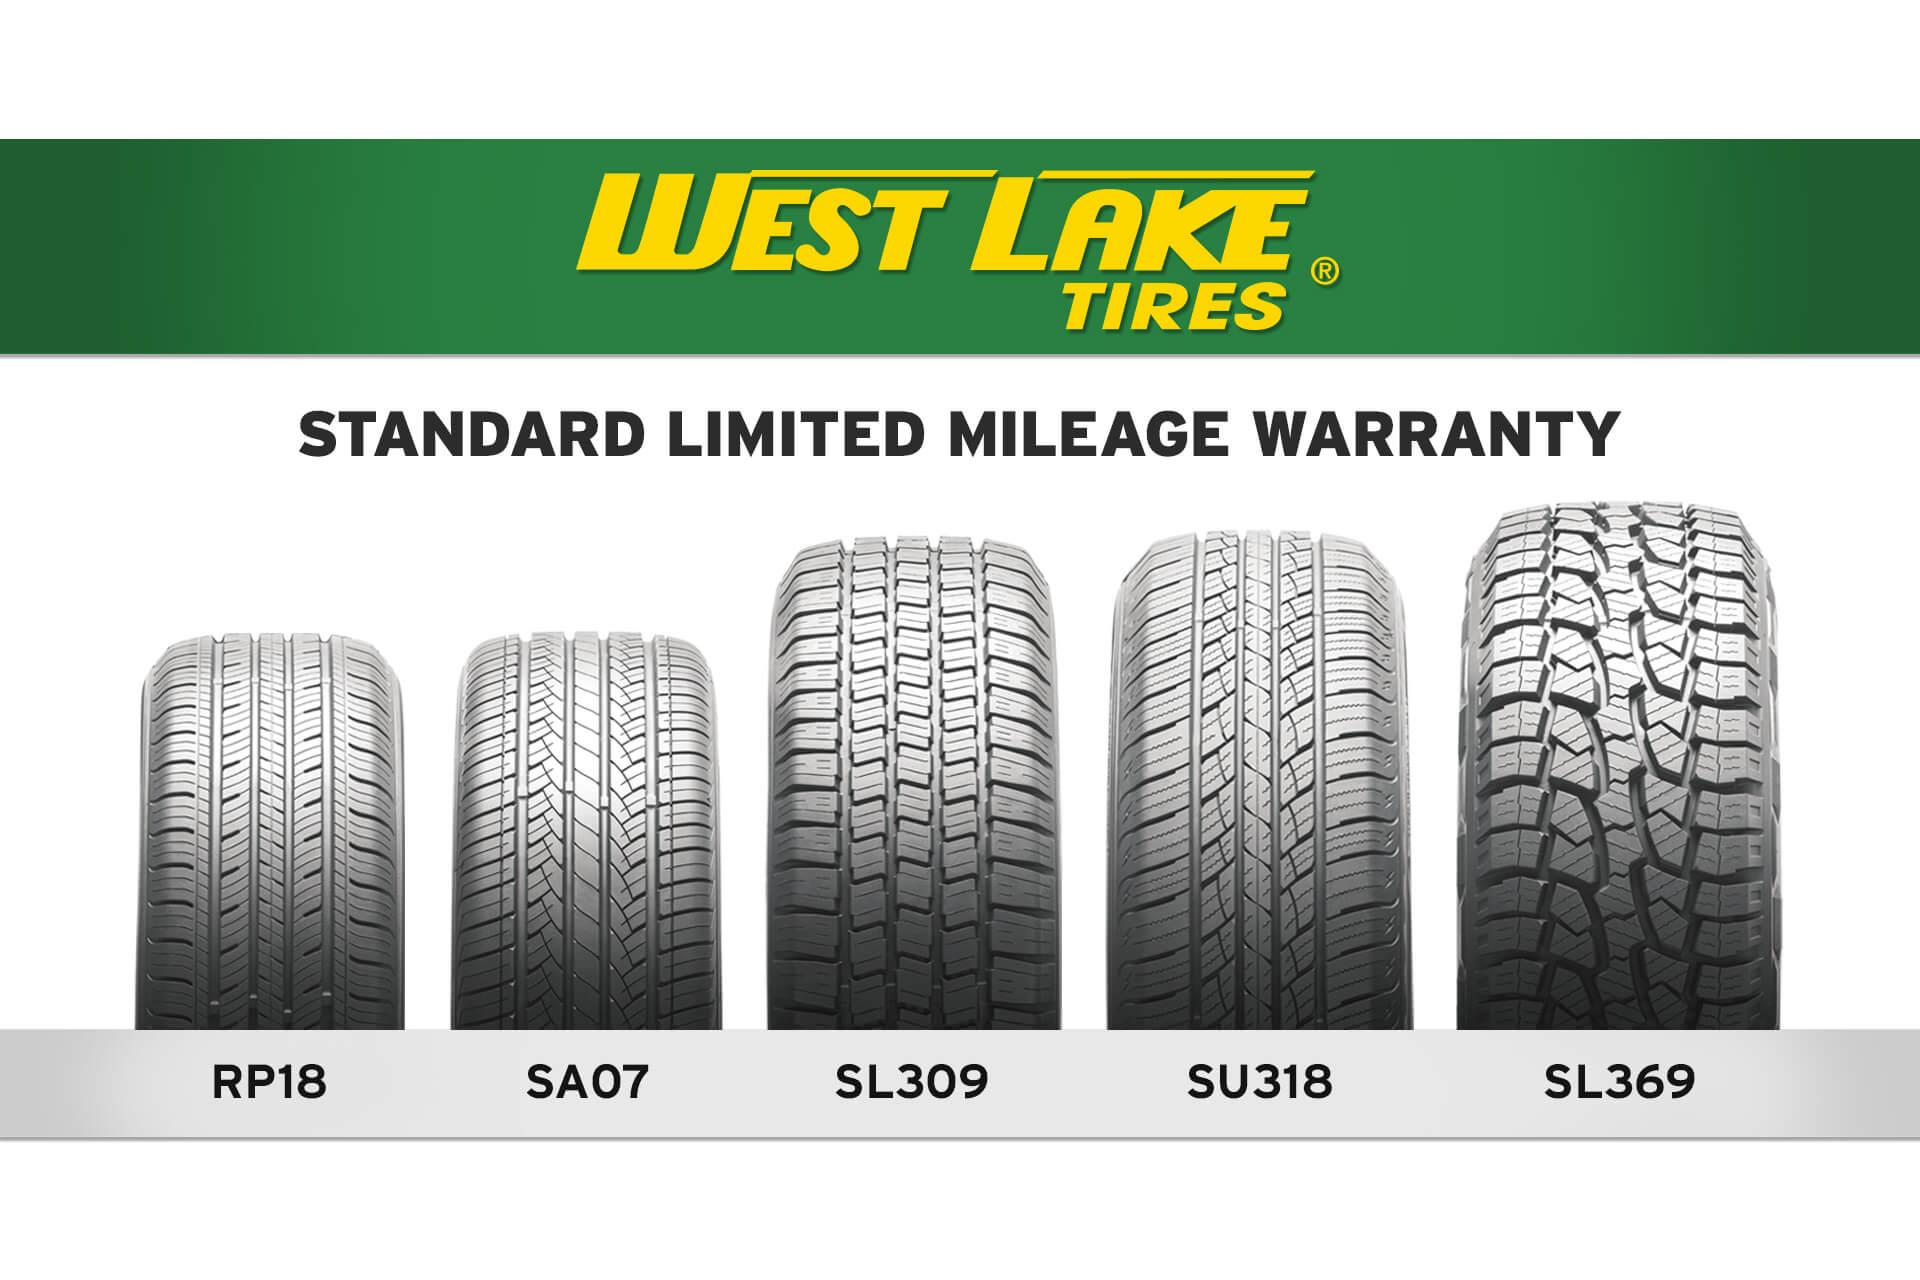 Westlake Tires Standard Limited Mileage Warranty